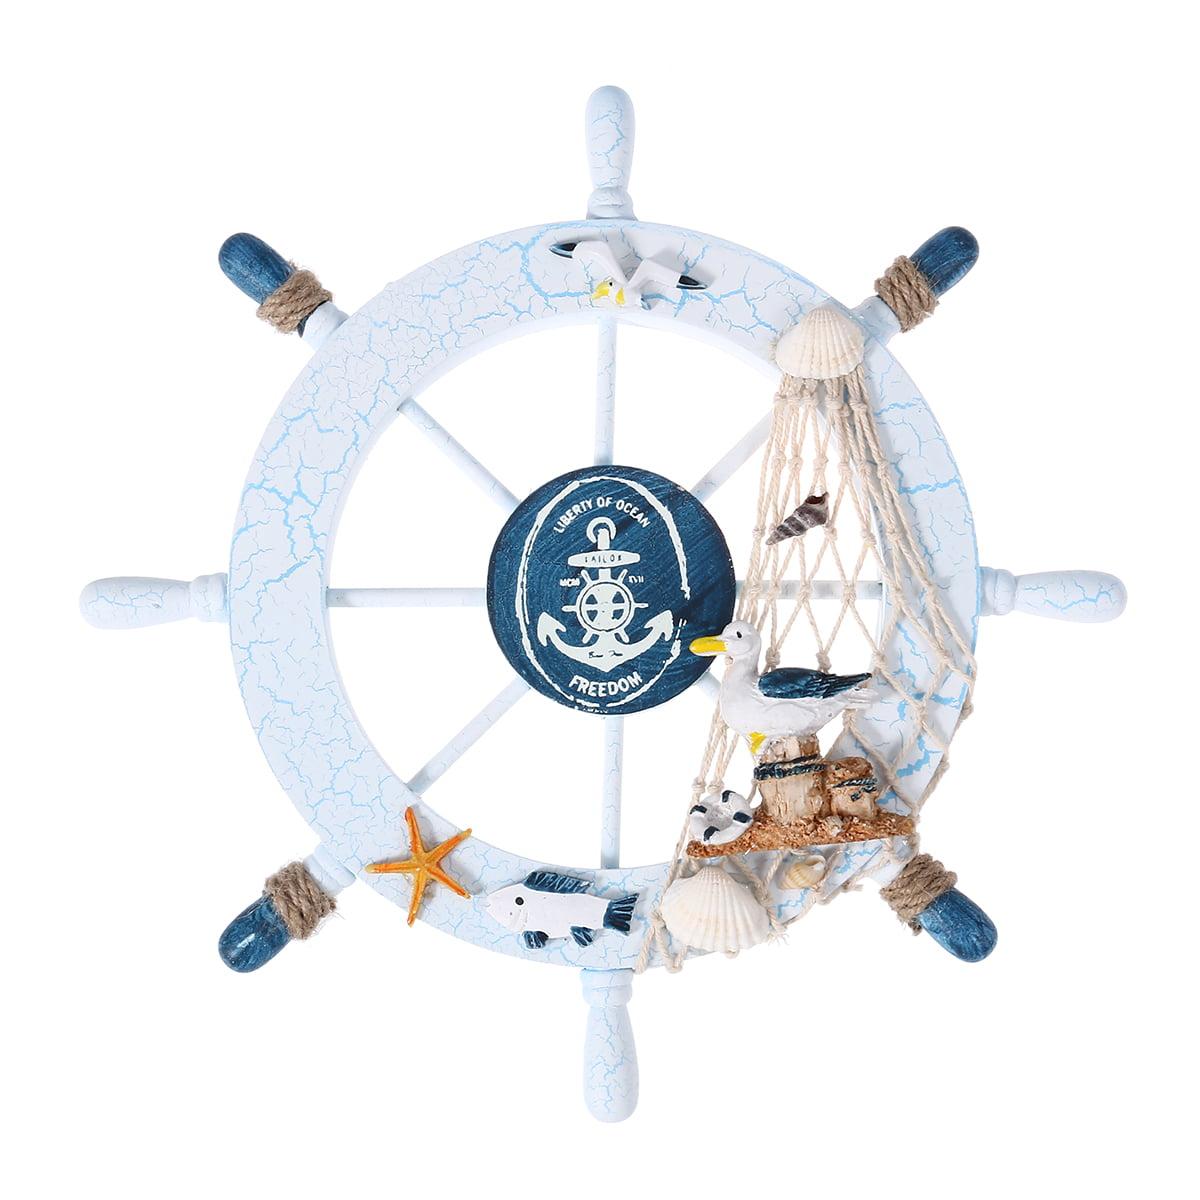 Nautical Beach Wooden Boat Ship Steering Wheel Fishing Net Shell Home Wall Decor Seabird Walmart Canada